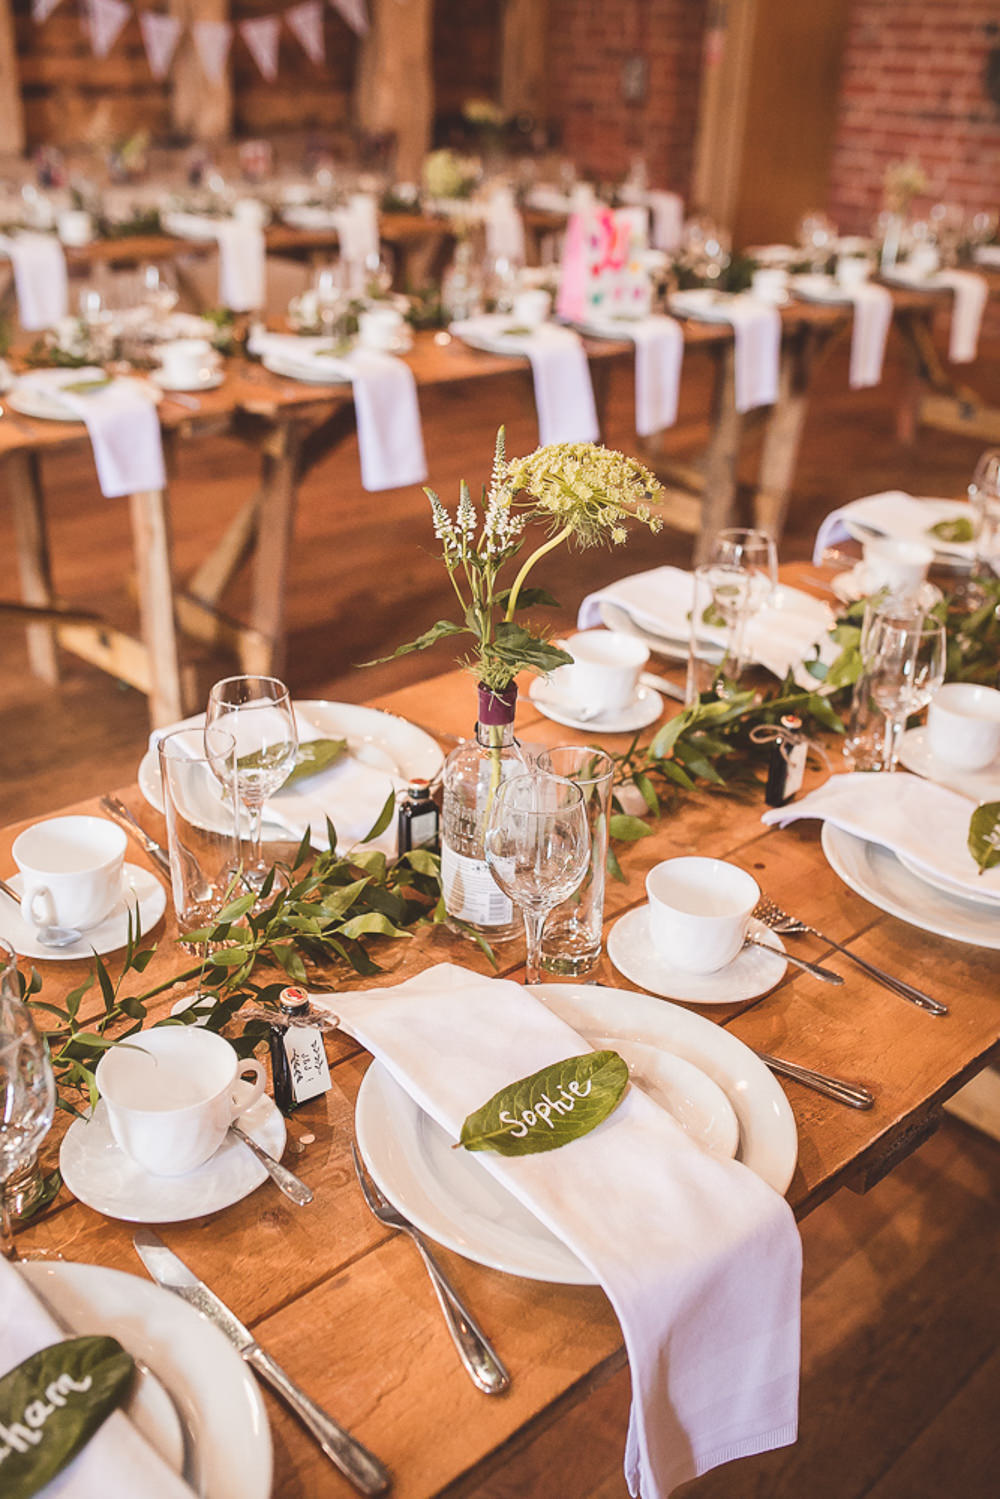 Centrepiece Decor Flowers Bottle Greenery Foliage Barn Wedding Shropshire Brightwing Photography